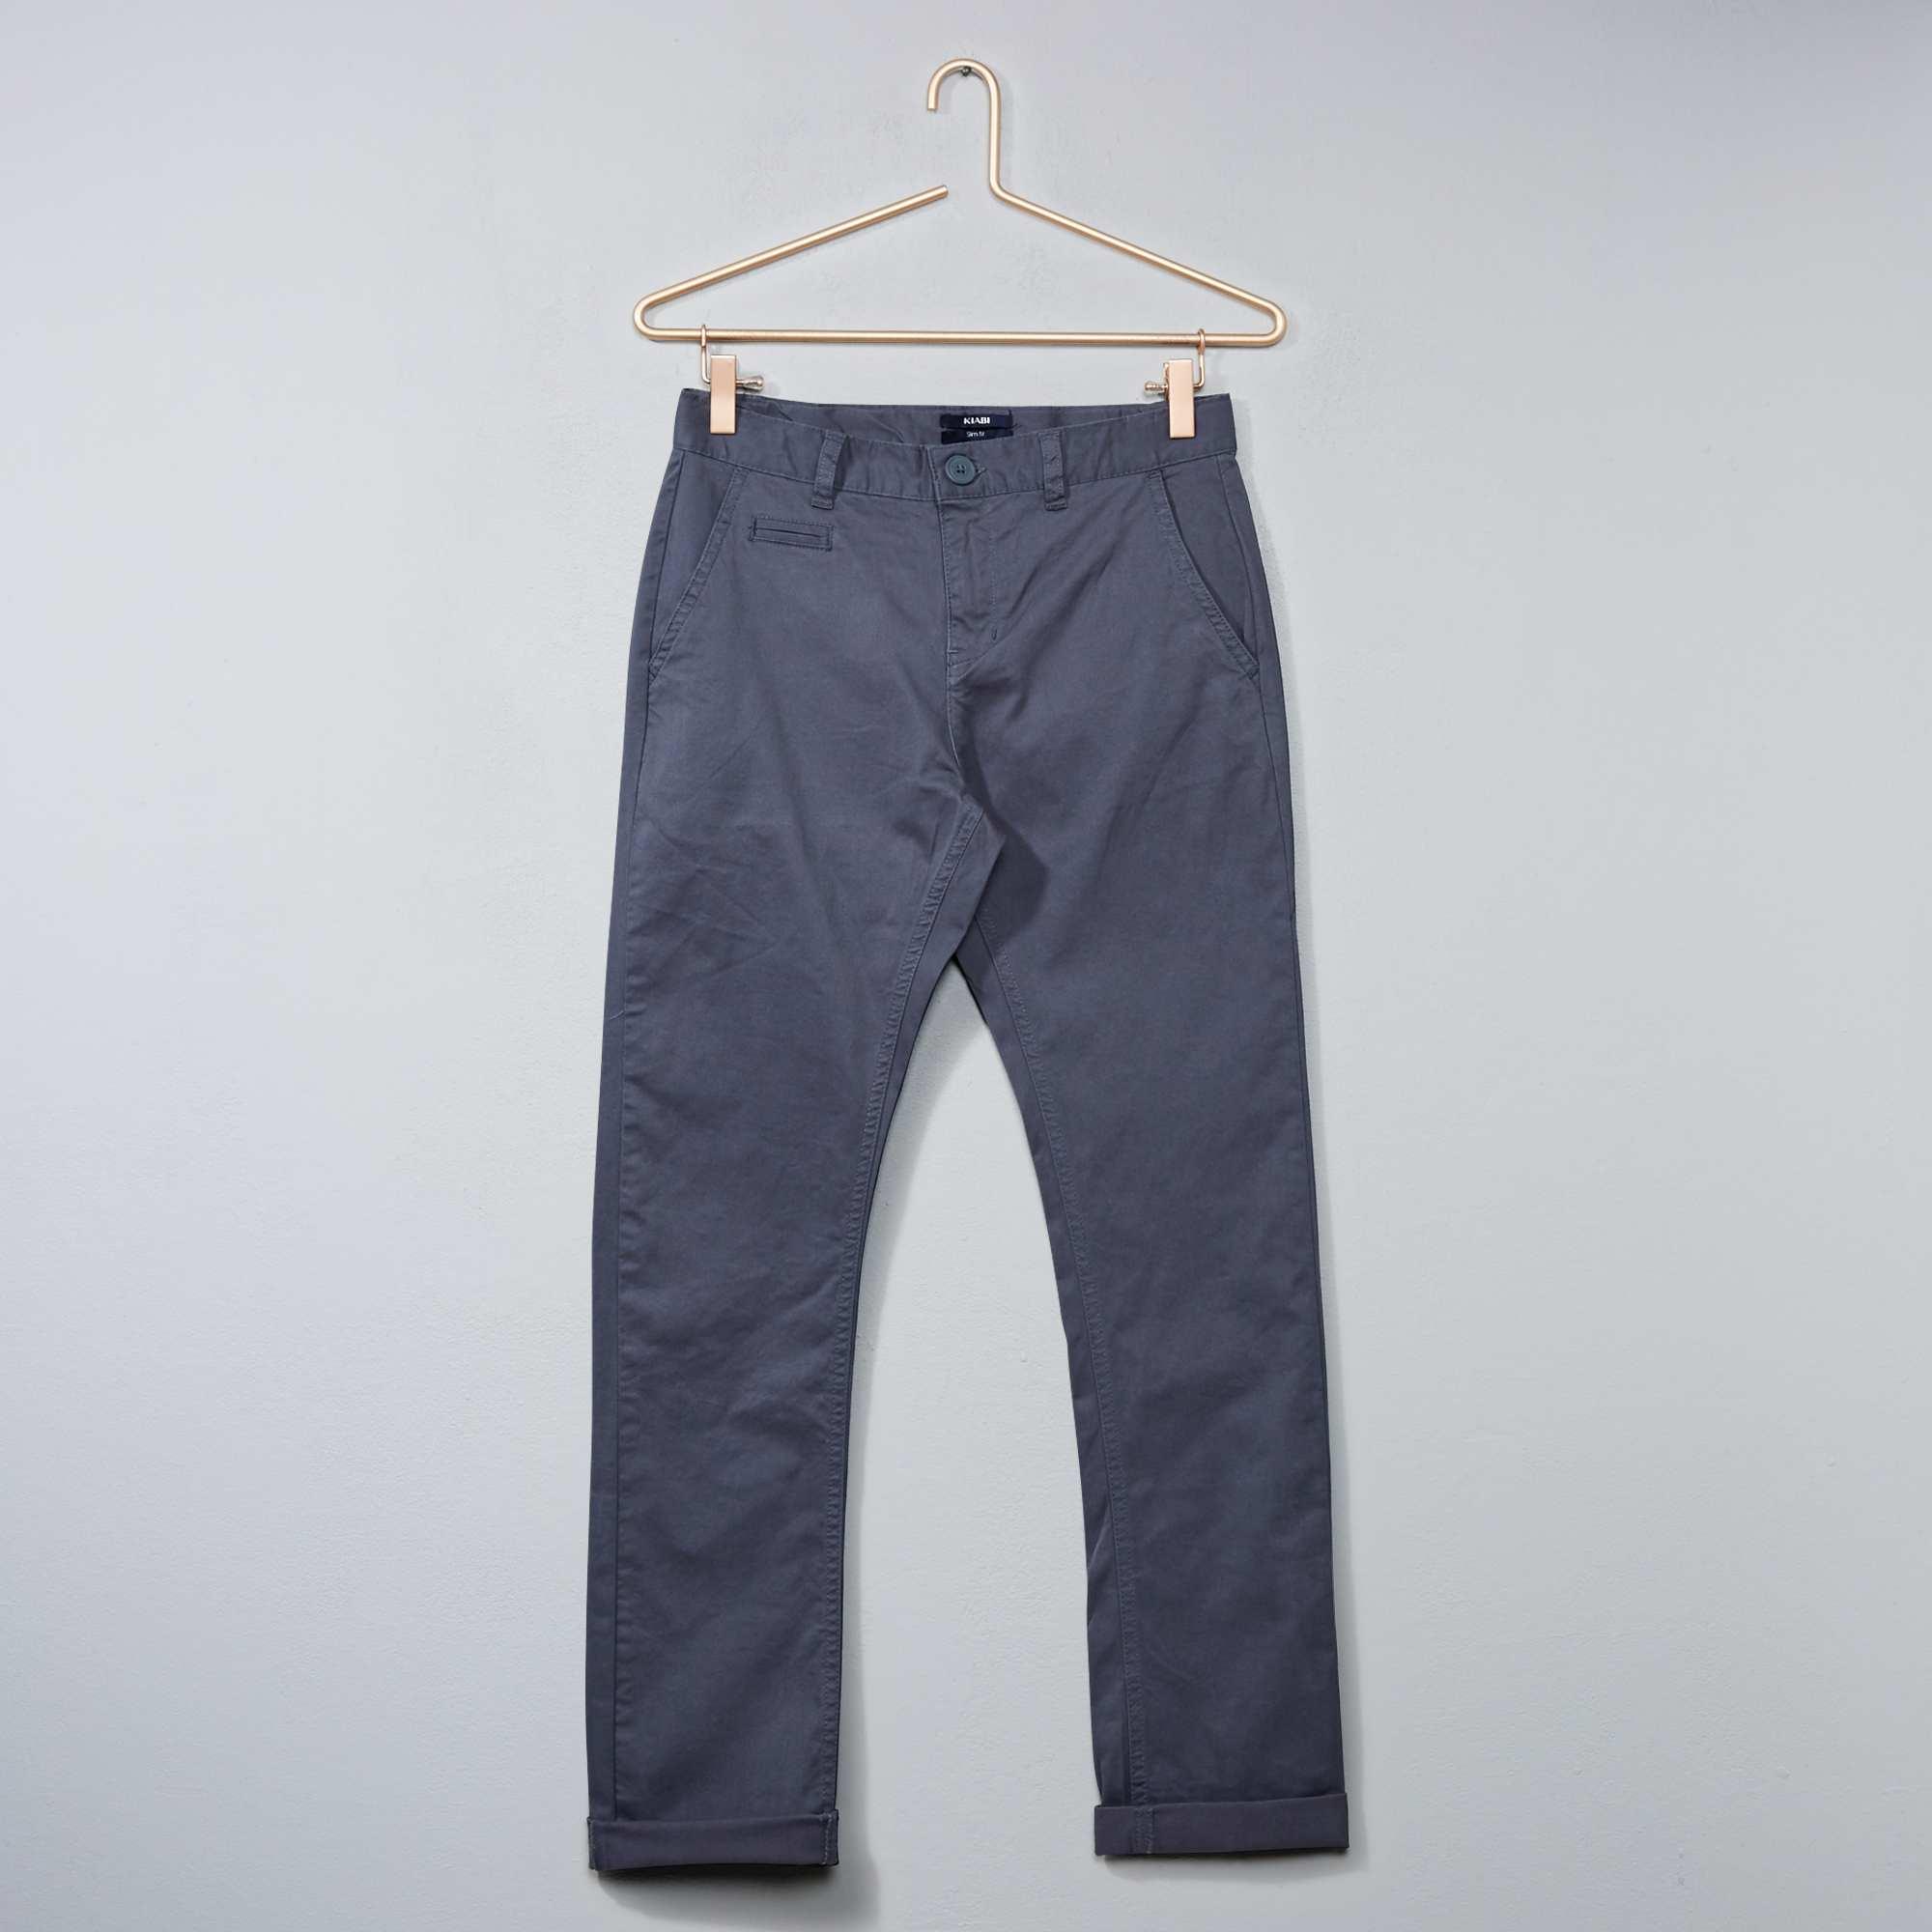 pantalon chino slim stretch gar on adolescent kiabi 13 00. Black Bedroom Furniture Sets. Home Design Ideas